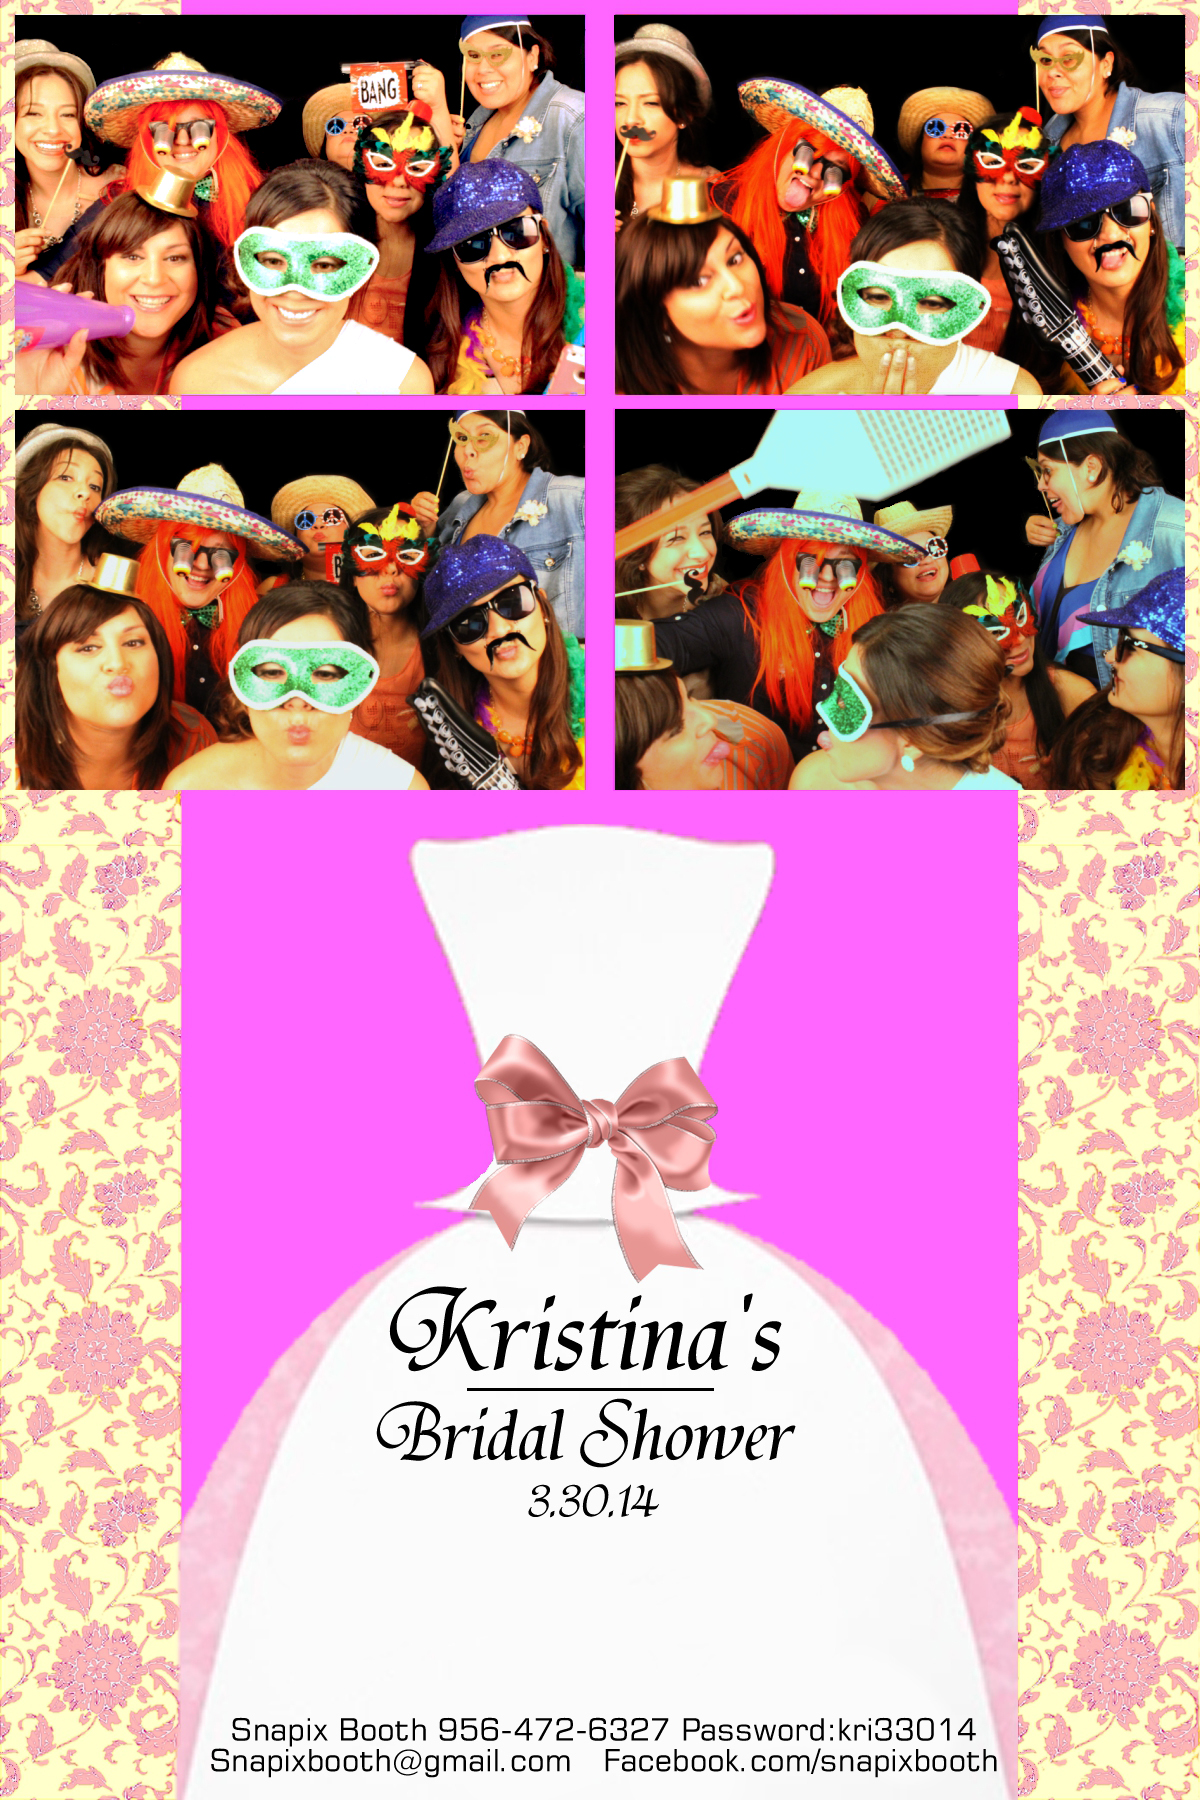 Kristina's Bridal Shower